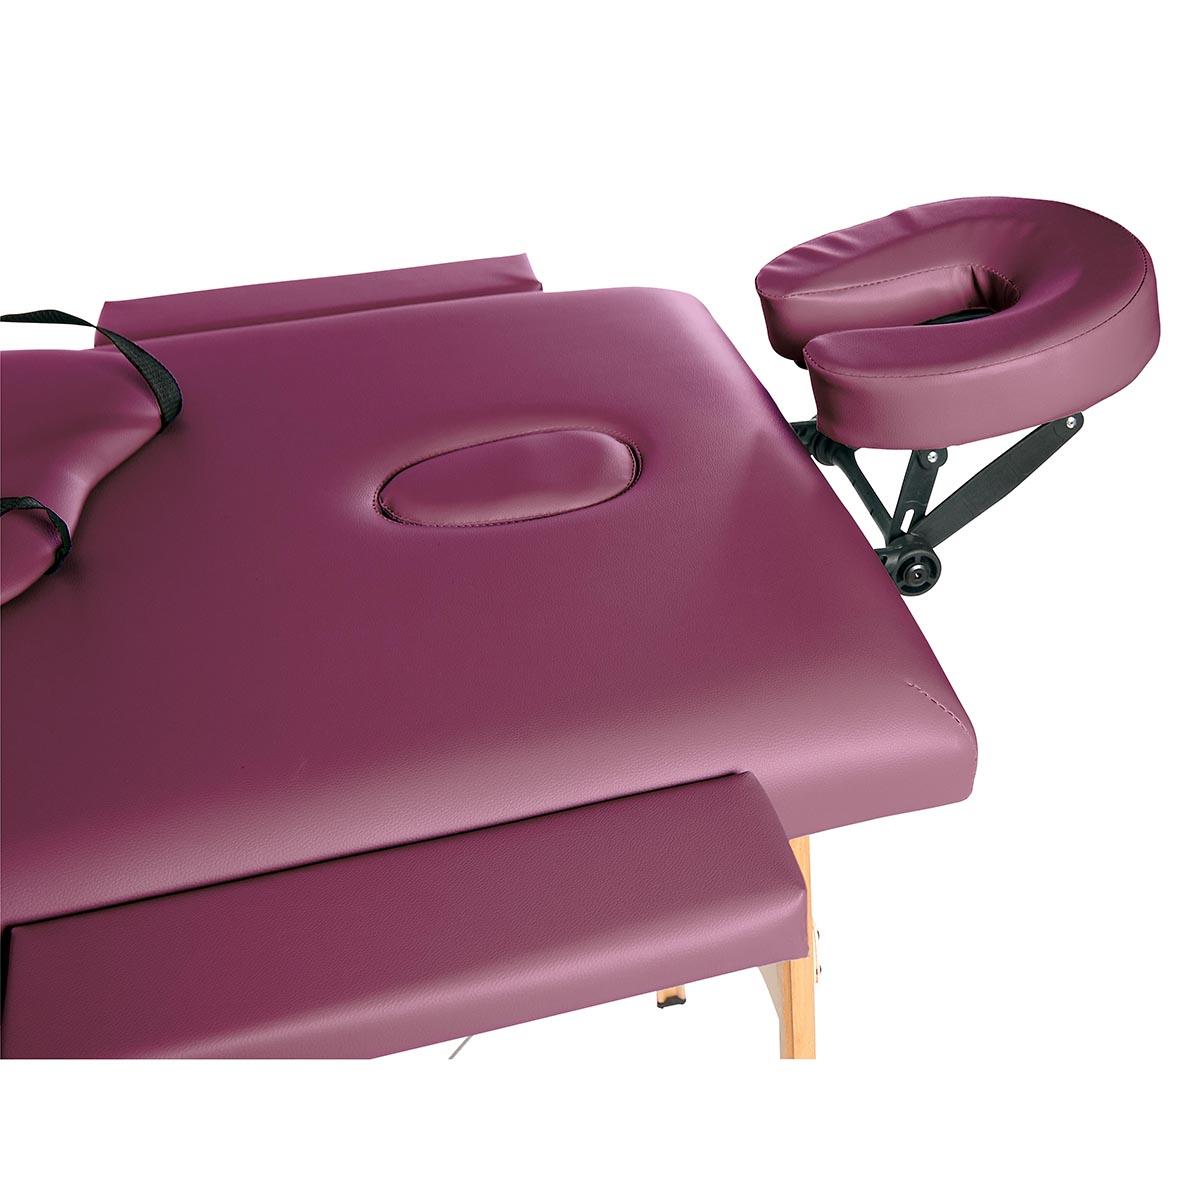 3b Scientific Stark Pilates Combo Chair: Portable Massage Table